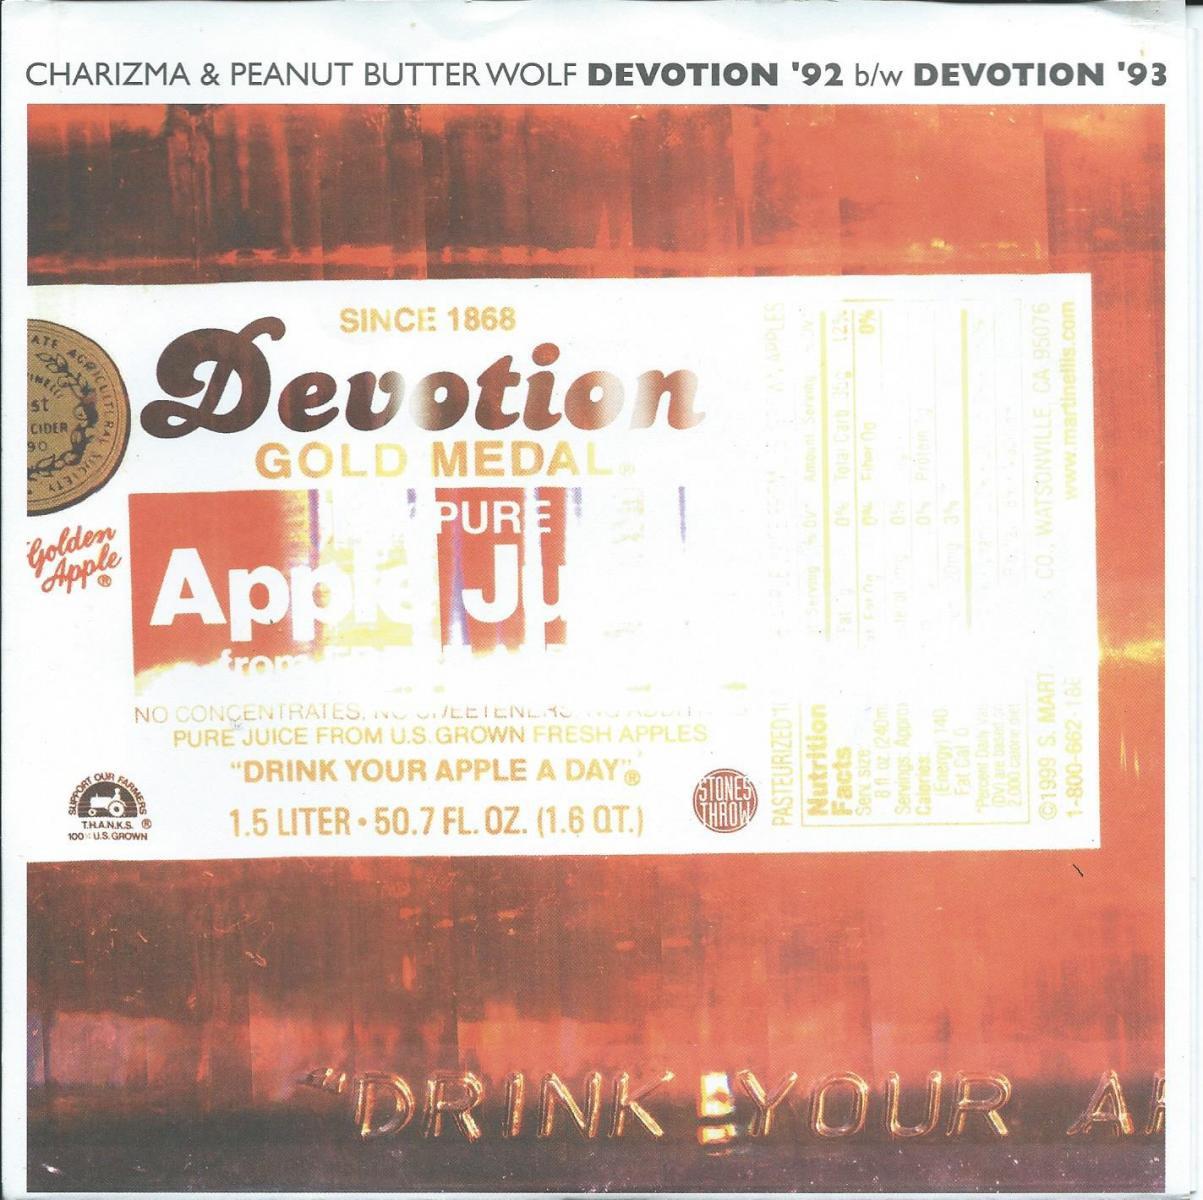 CHARIZMA & PEANUT BUTTER WOLF / DEVOTION '92 / DEVOTION '93 (7